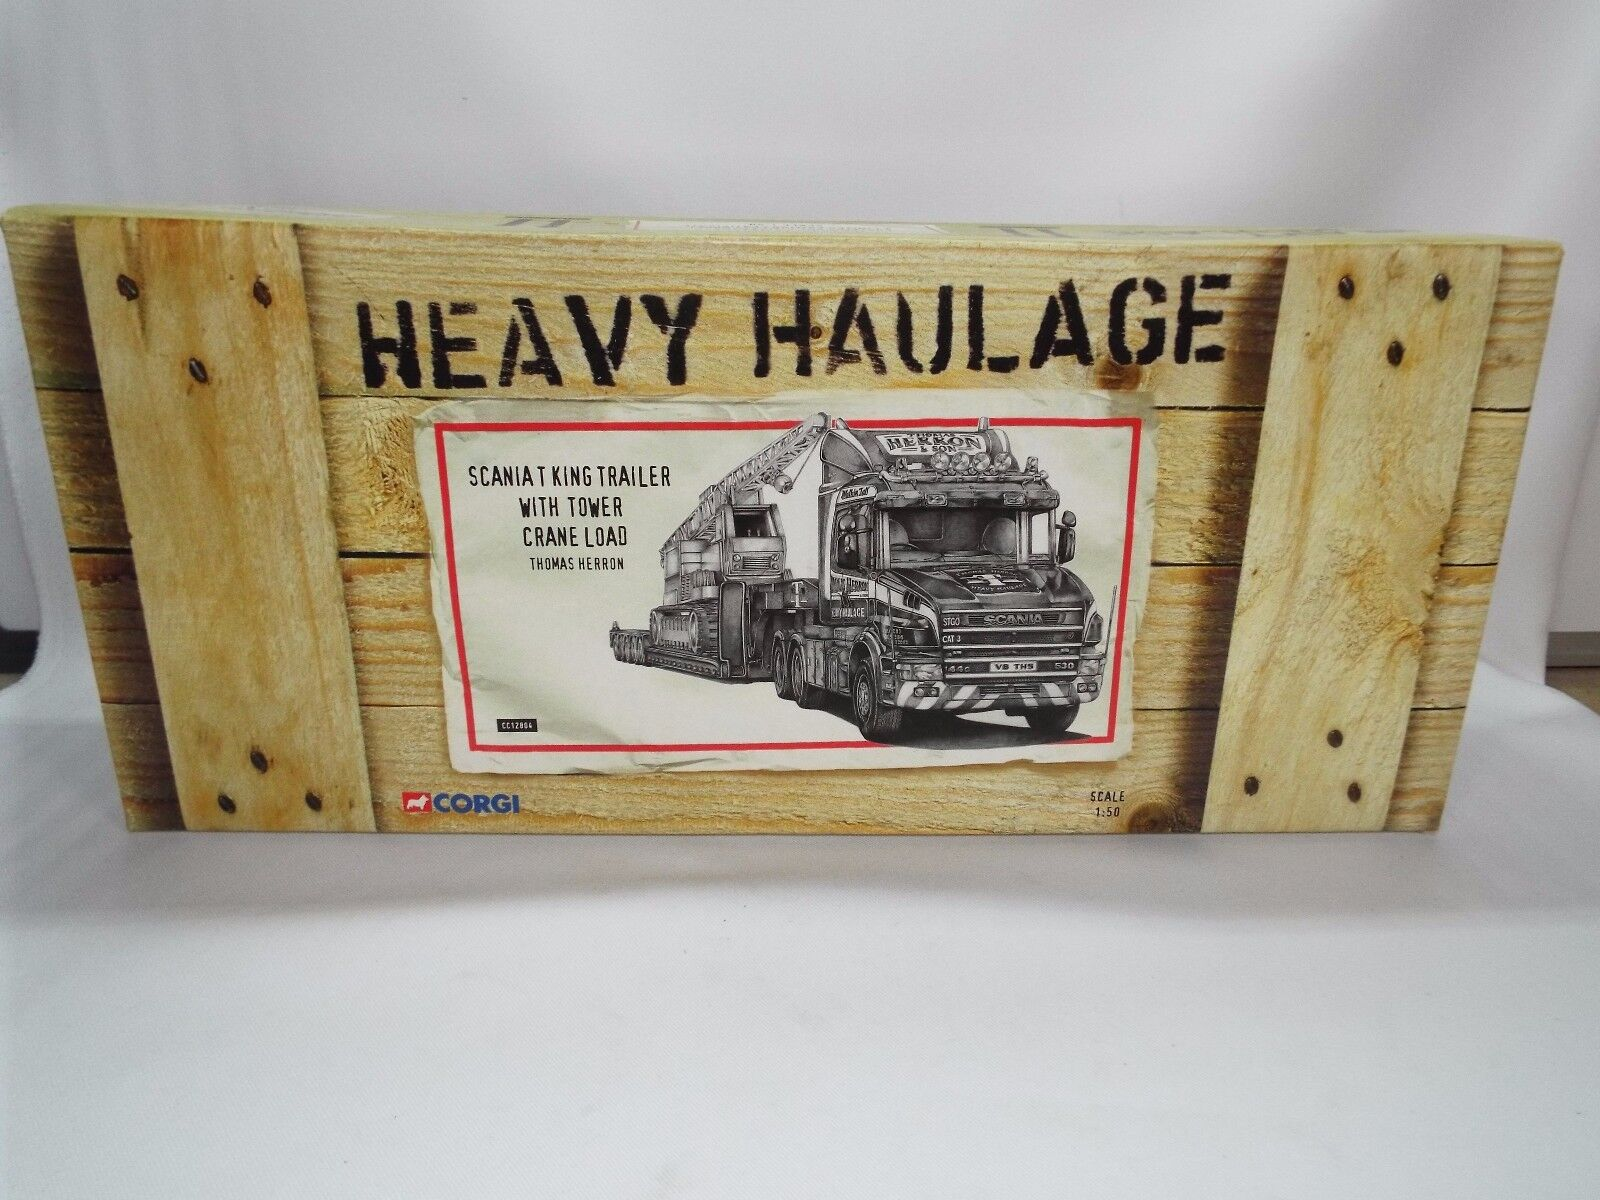 Corgi Heavy Haulage No 12804 Thomas Herron Set Scania T and crane New